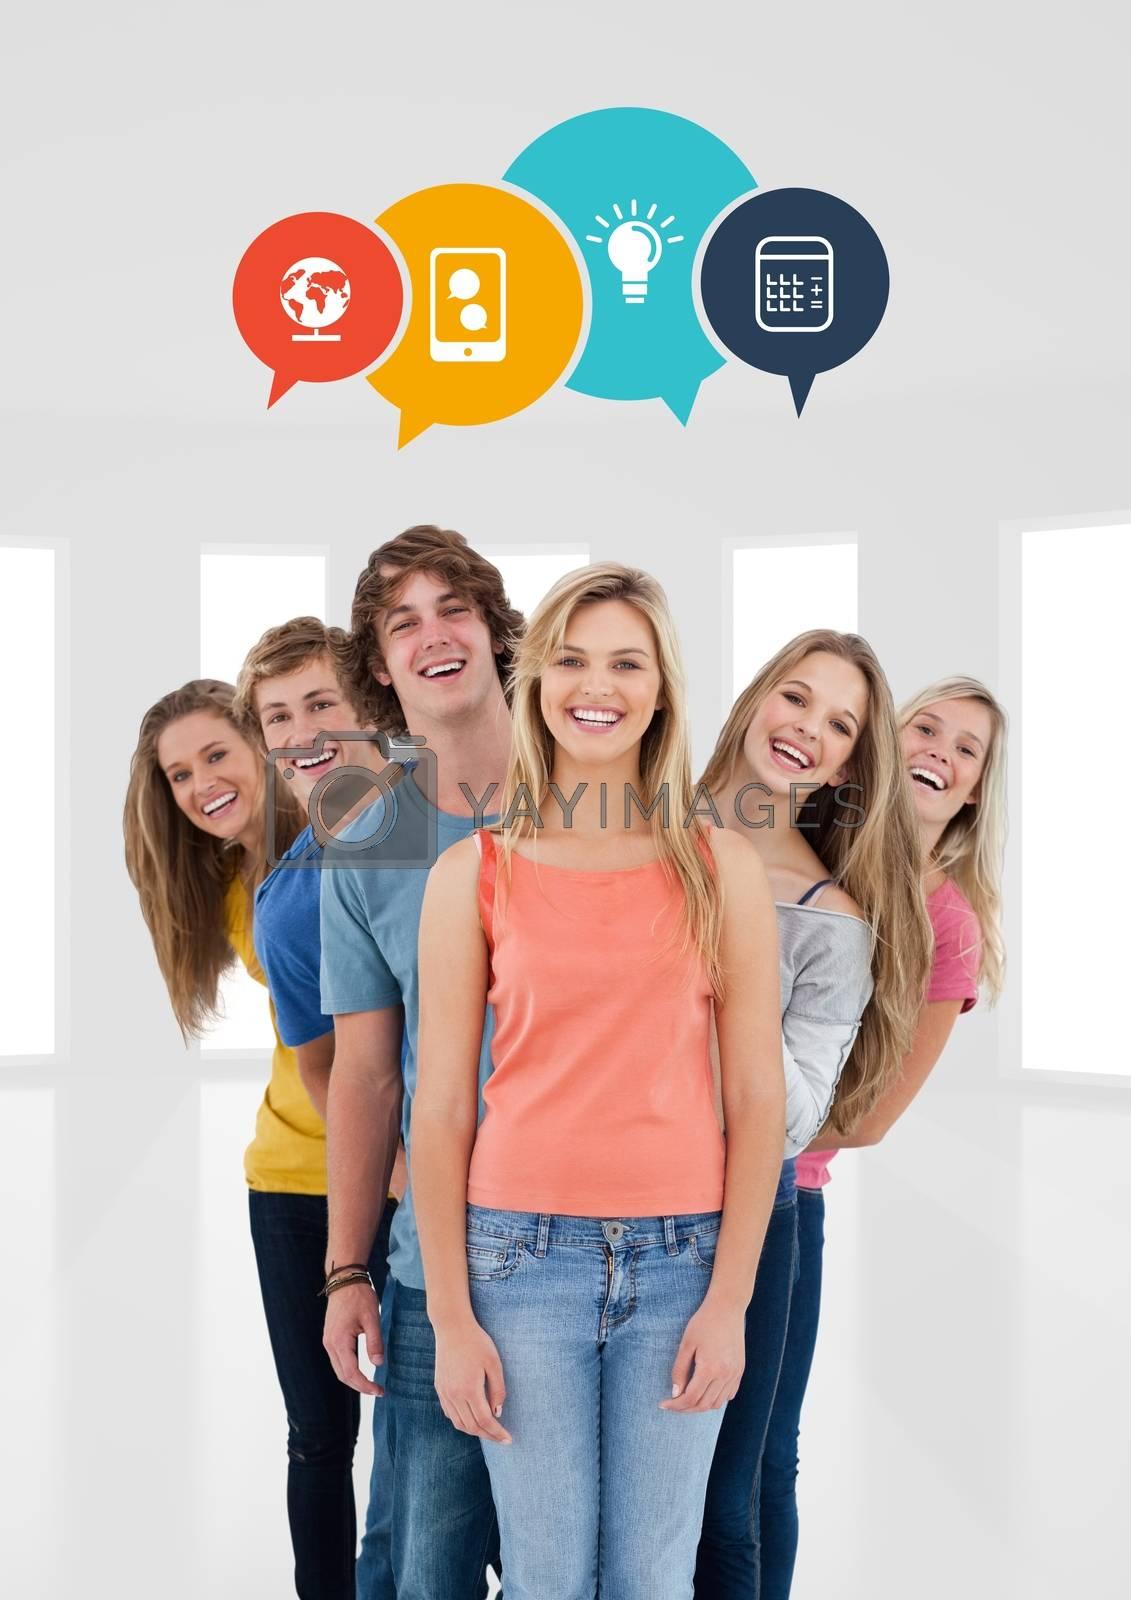 Digital composite of Teens in row smiling